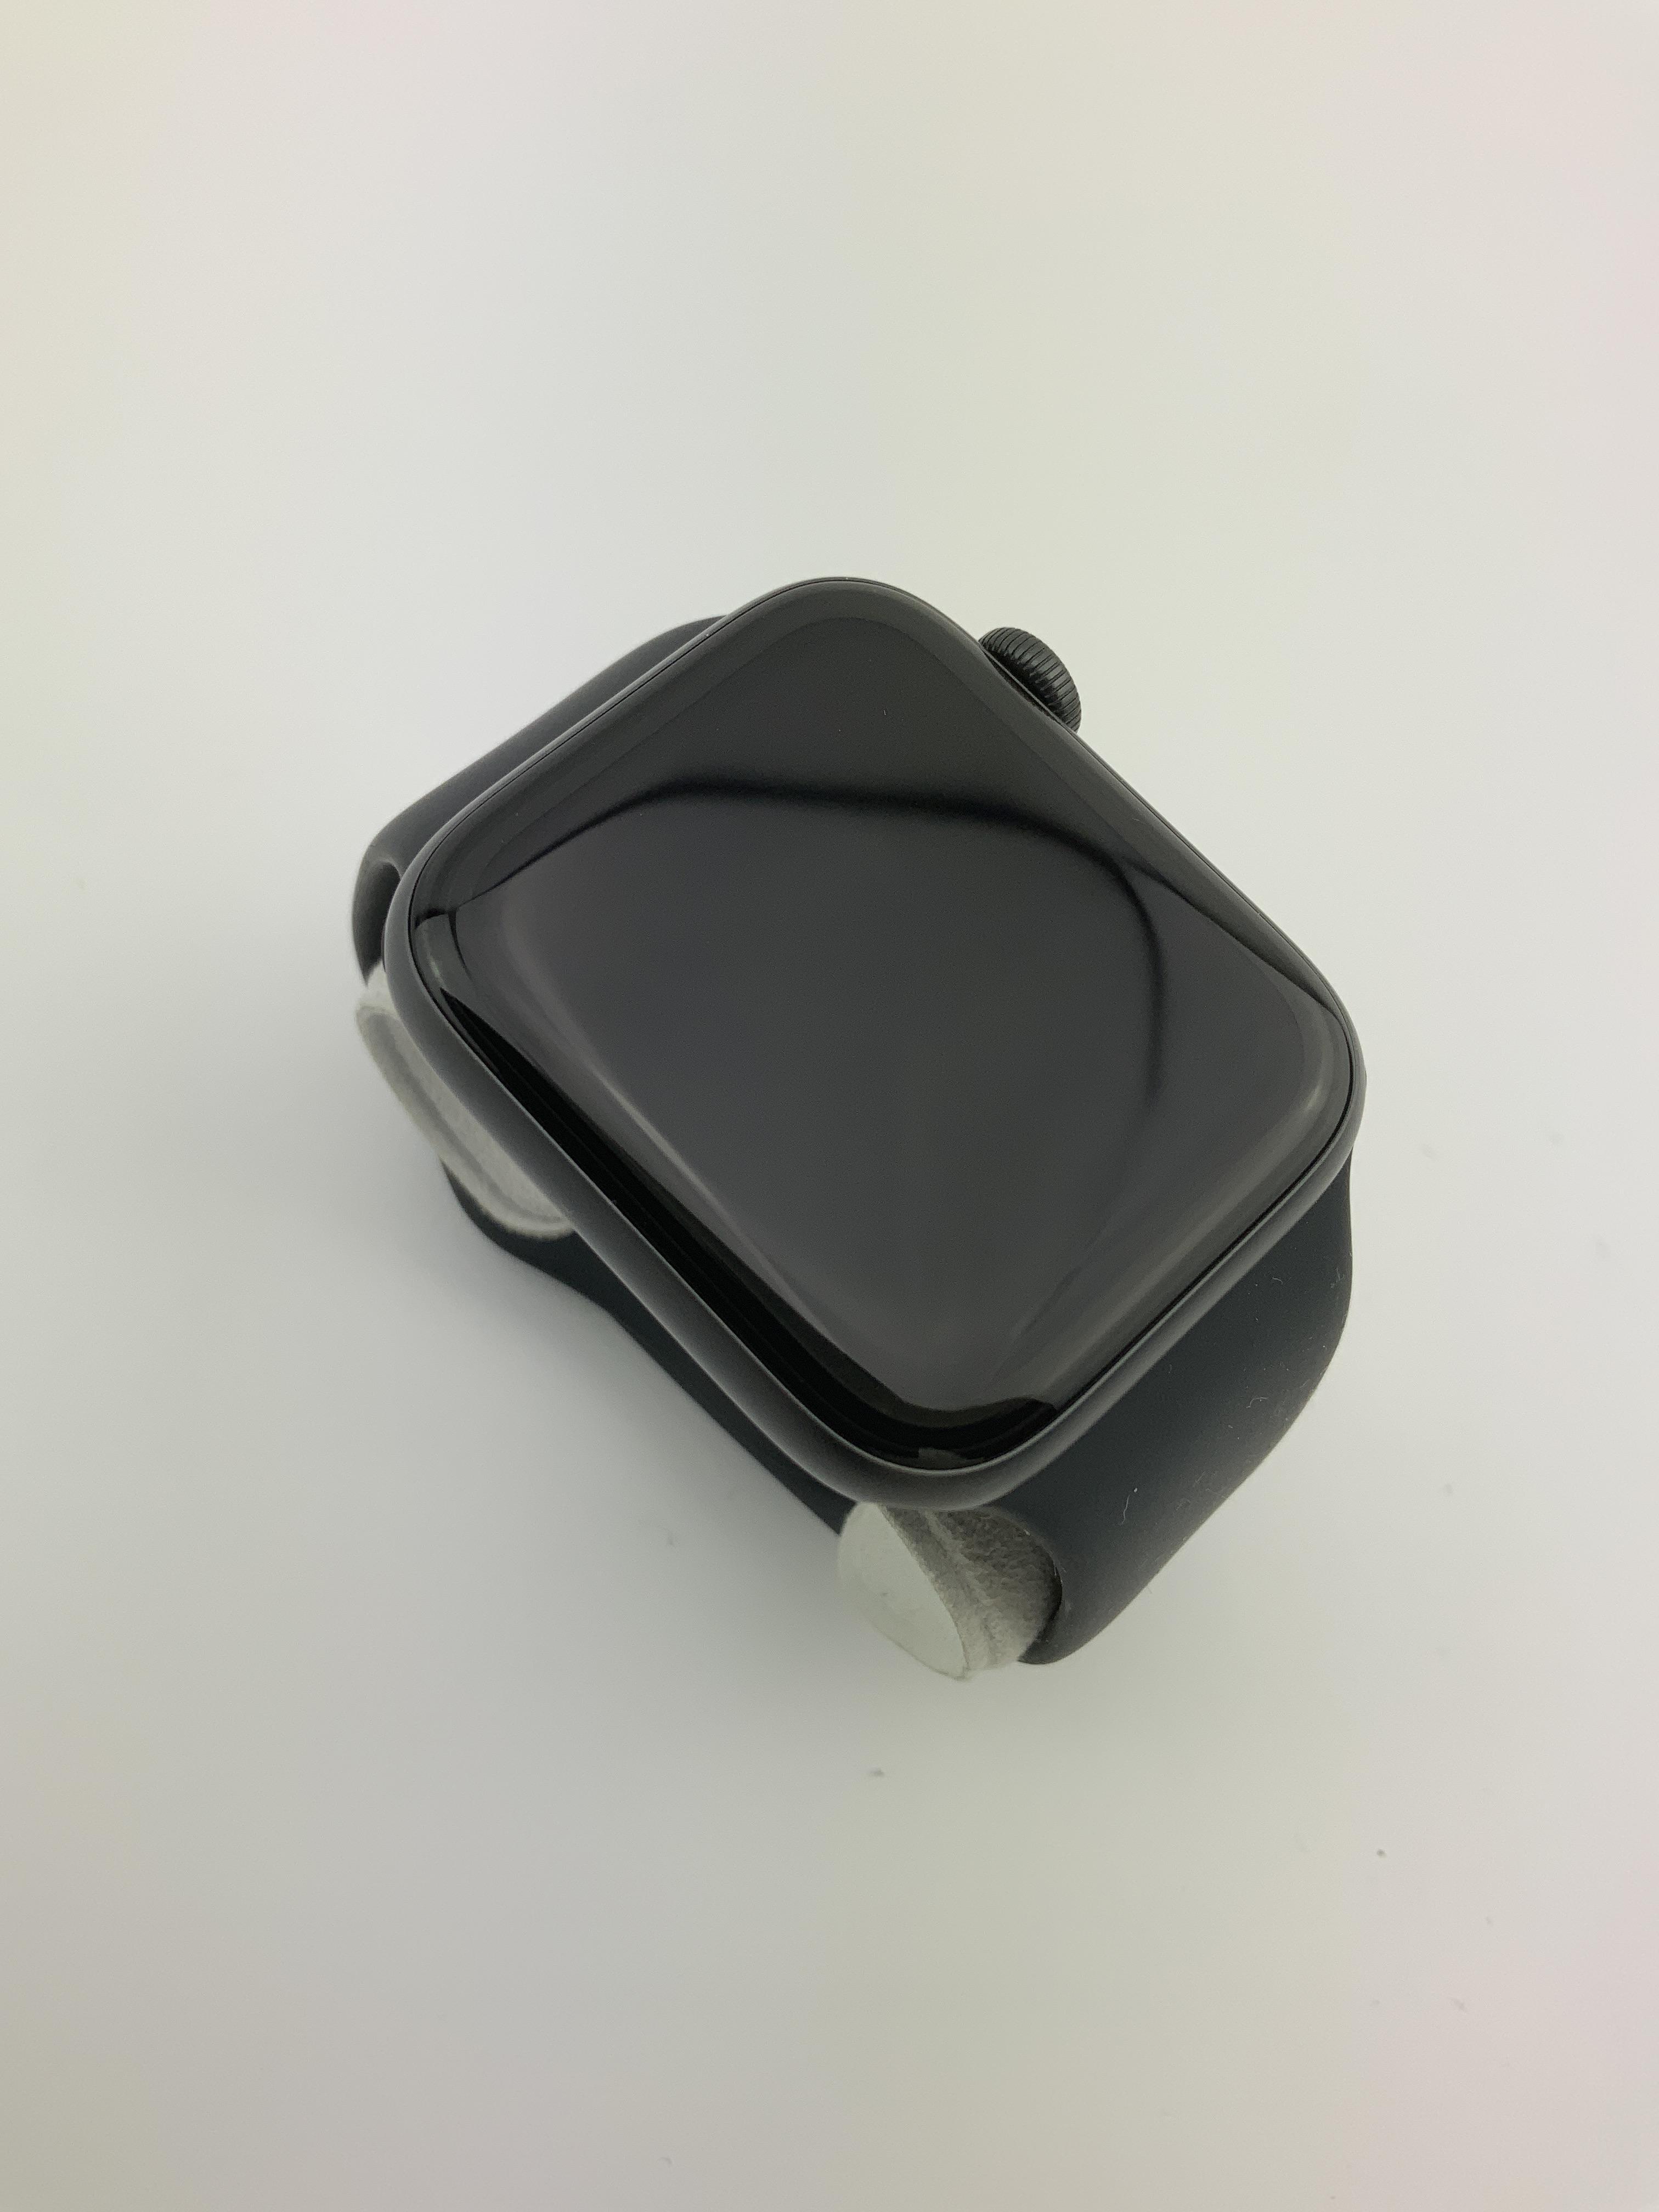 Watch Series 5 Aluminum Cellular (44mm), Space Gray, Bild 2